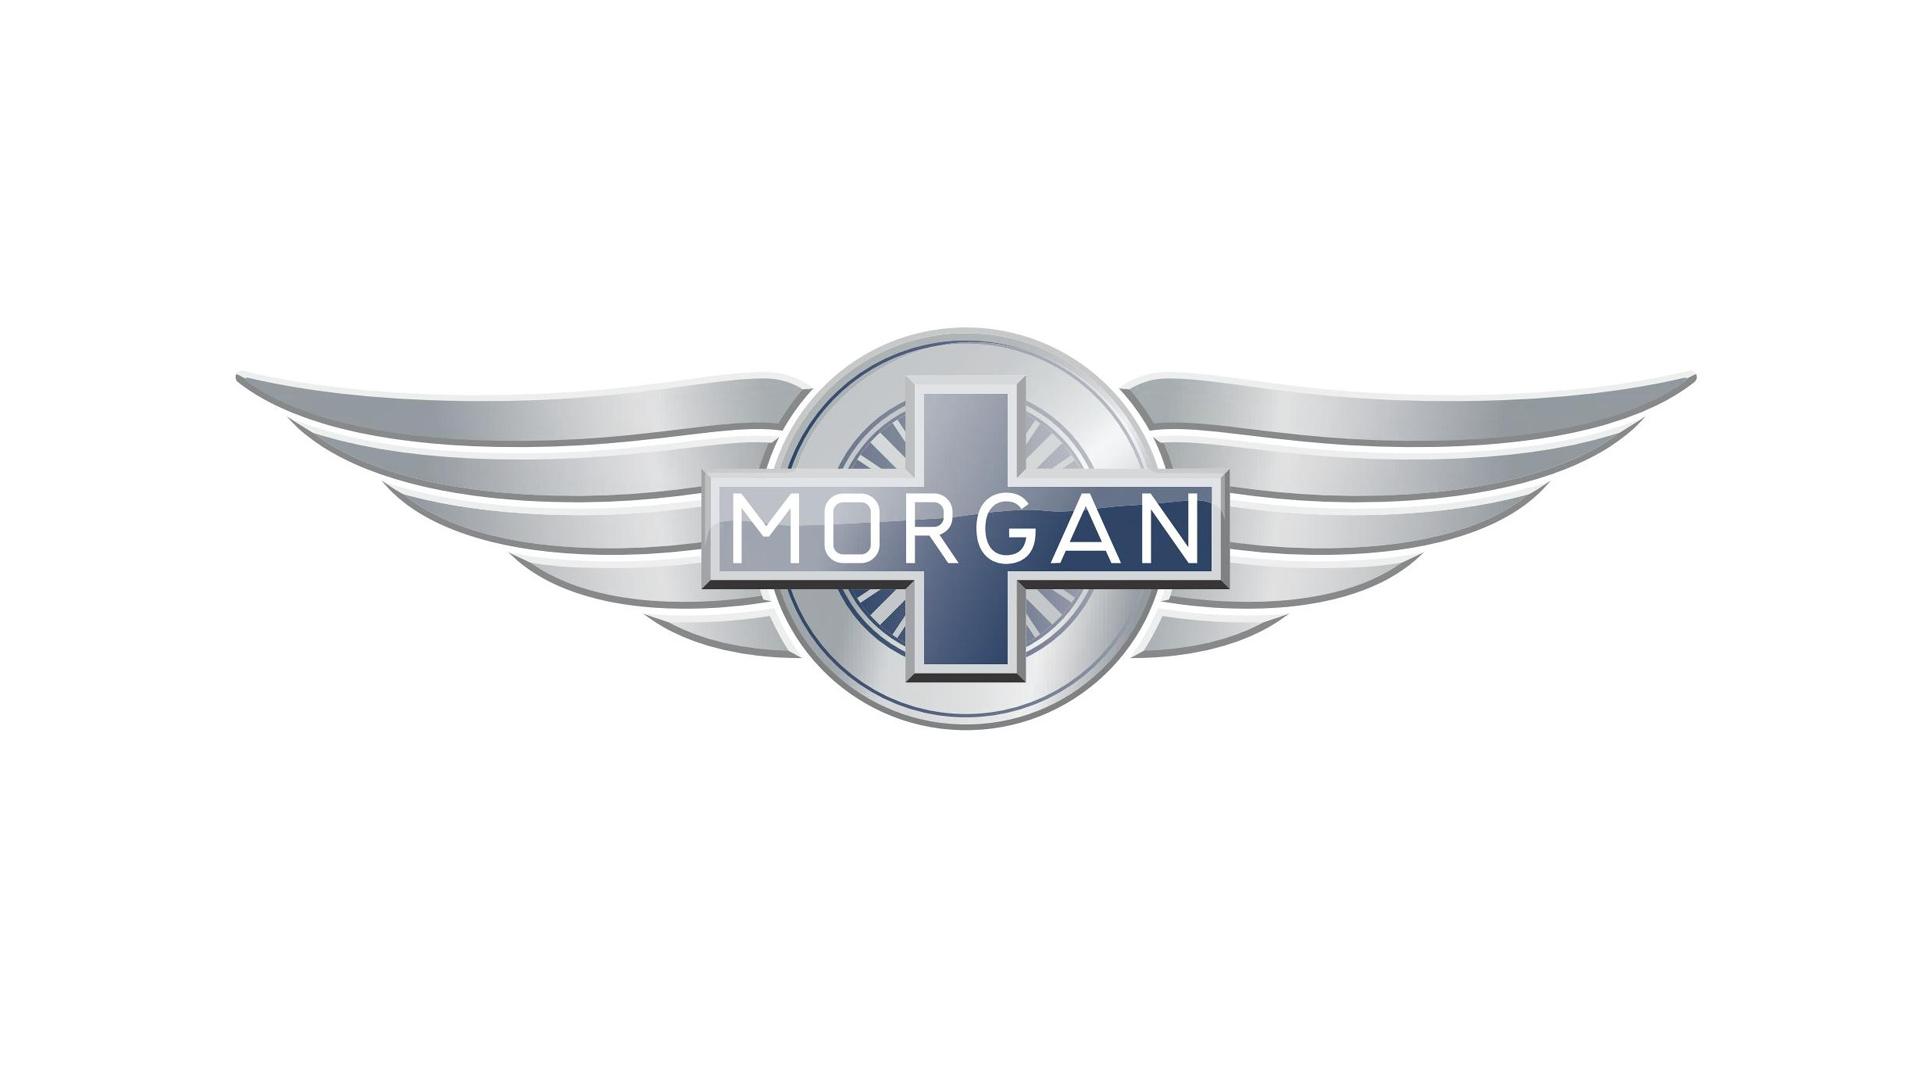 Morgan-motor-co-badge